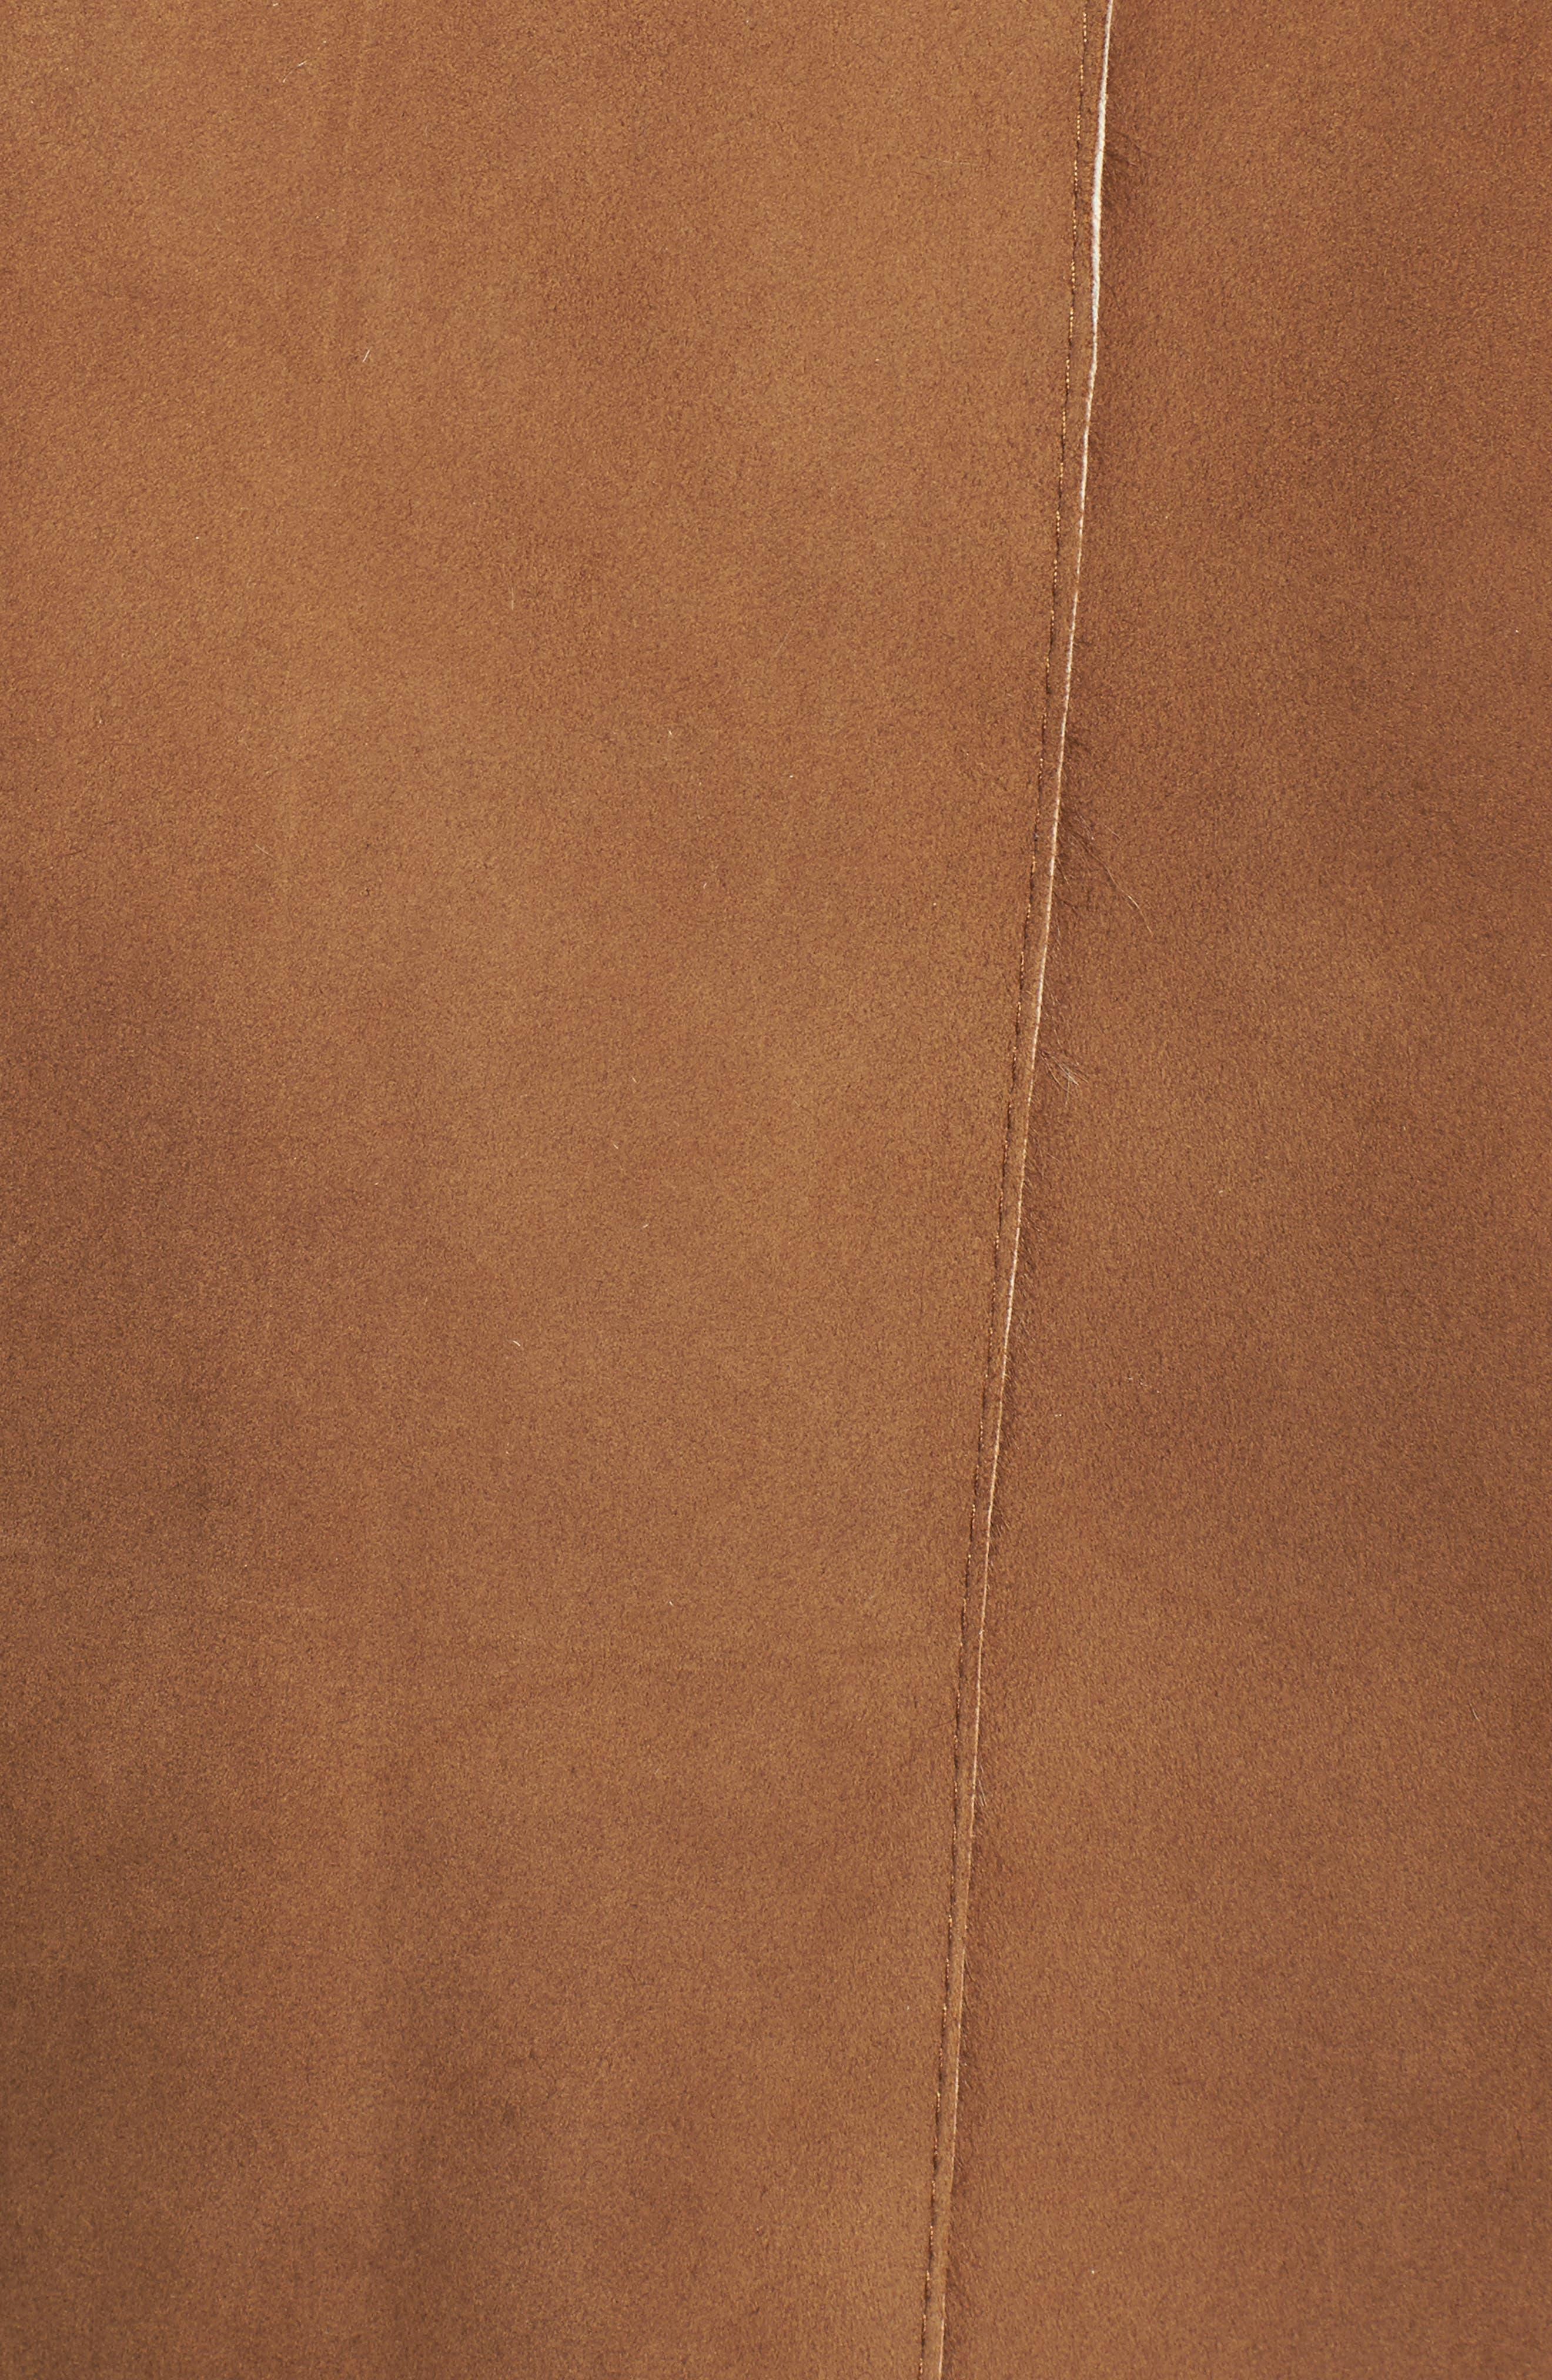 Genuine Toscana Shearling Coat,                             Alternate thumbnail 6, color,                             202